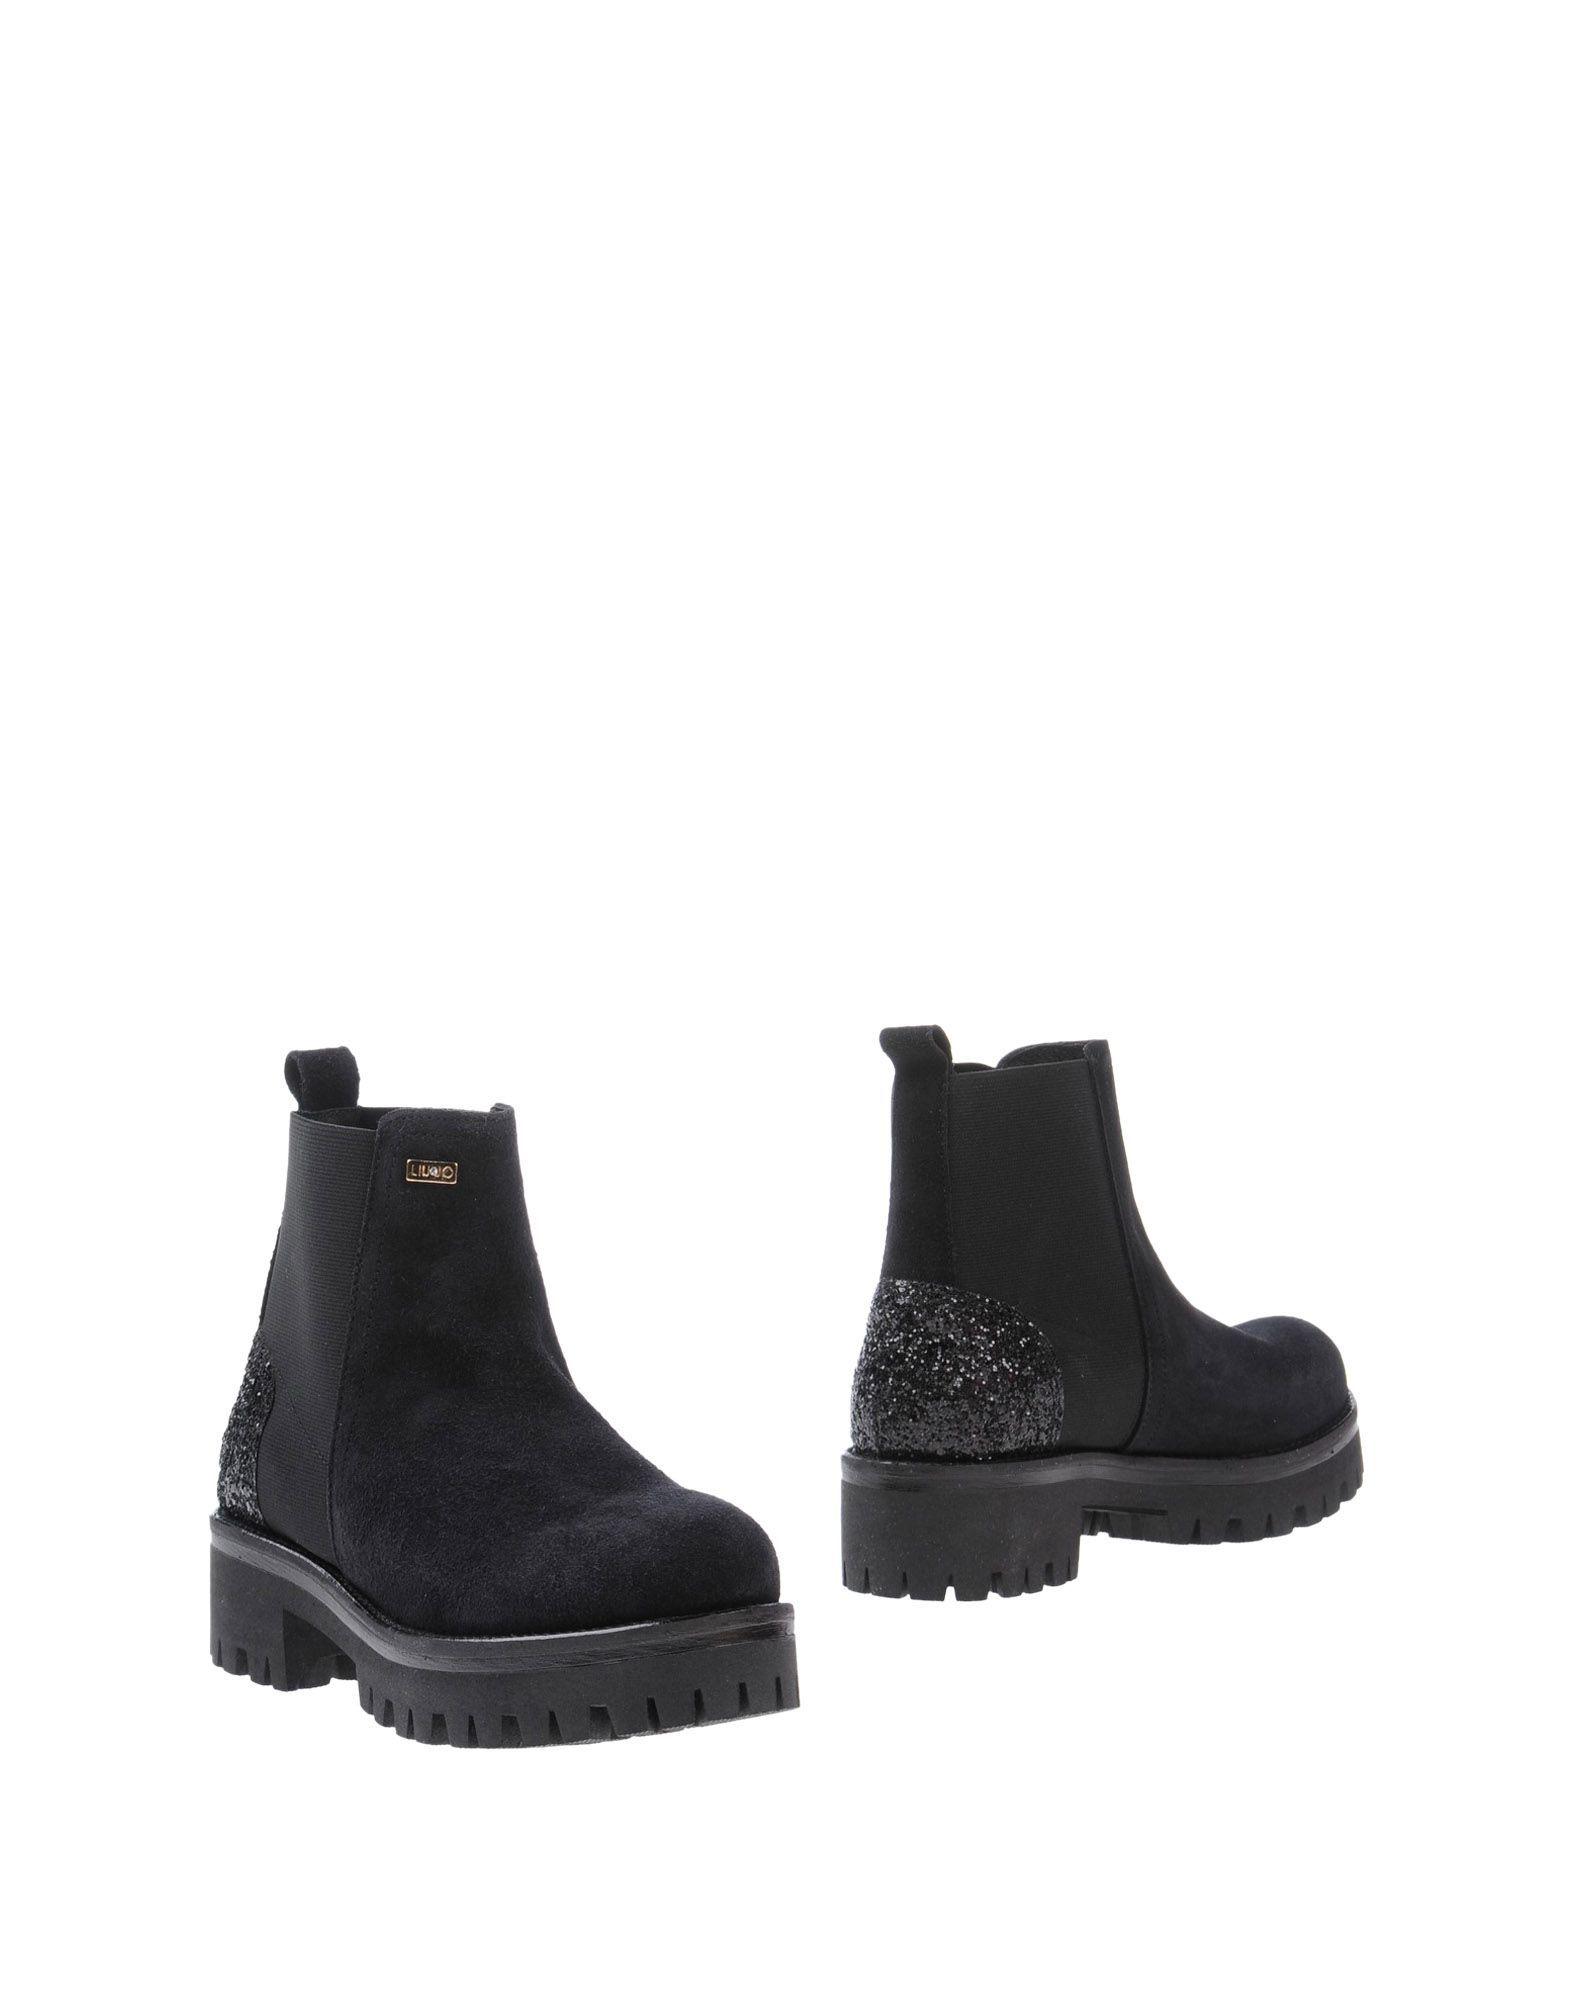 Liu Jo Black Leather Flat Ankle Boots